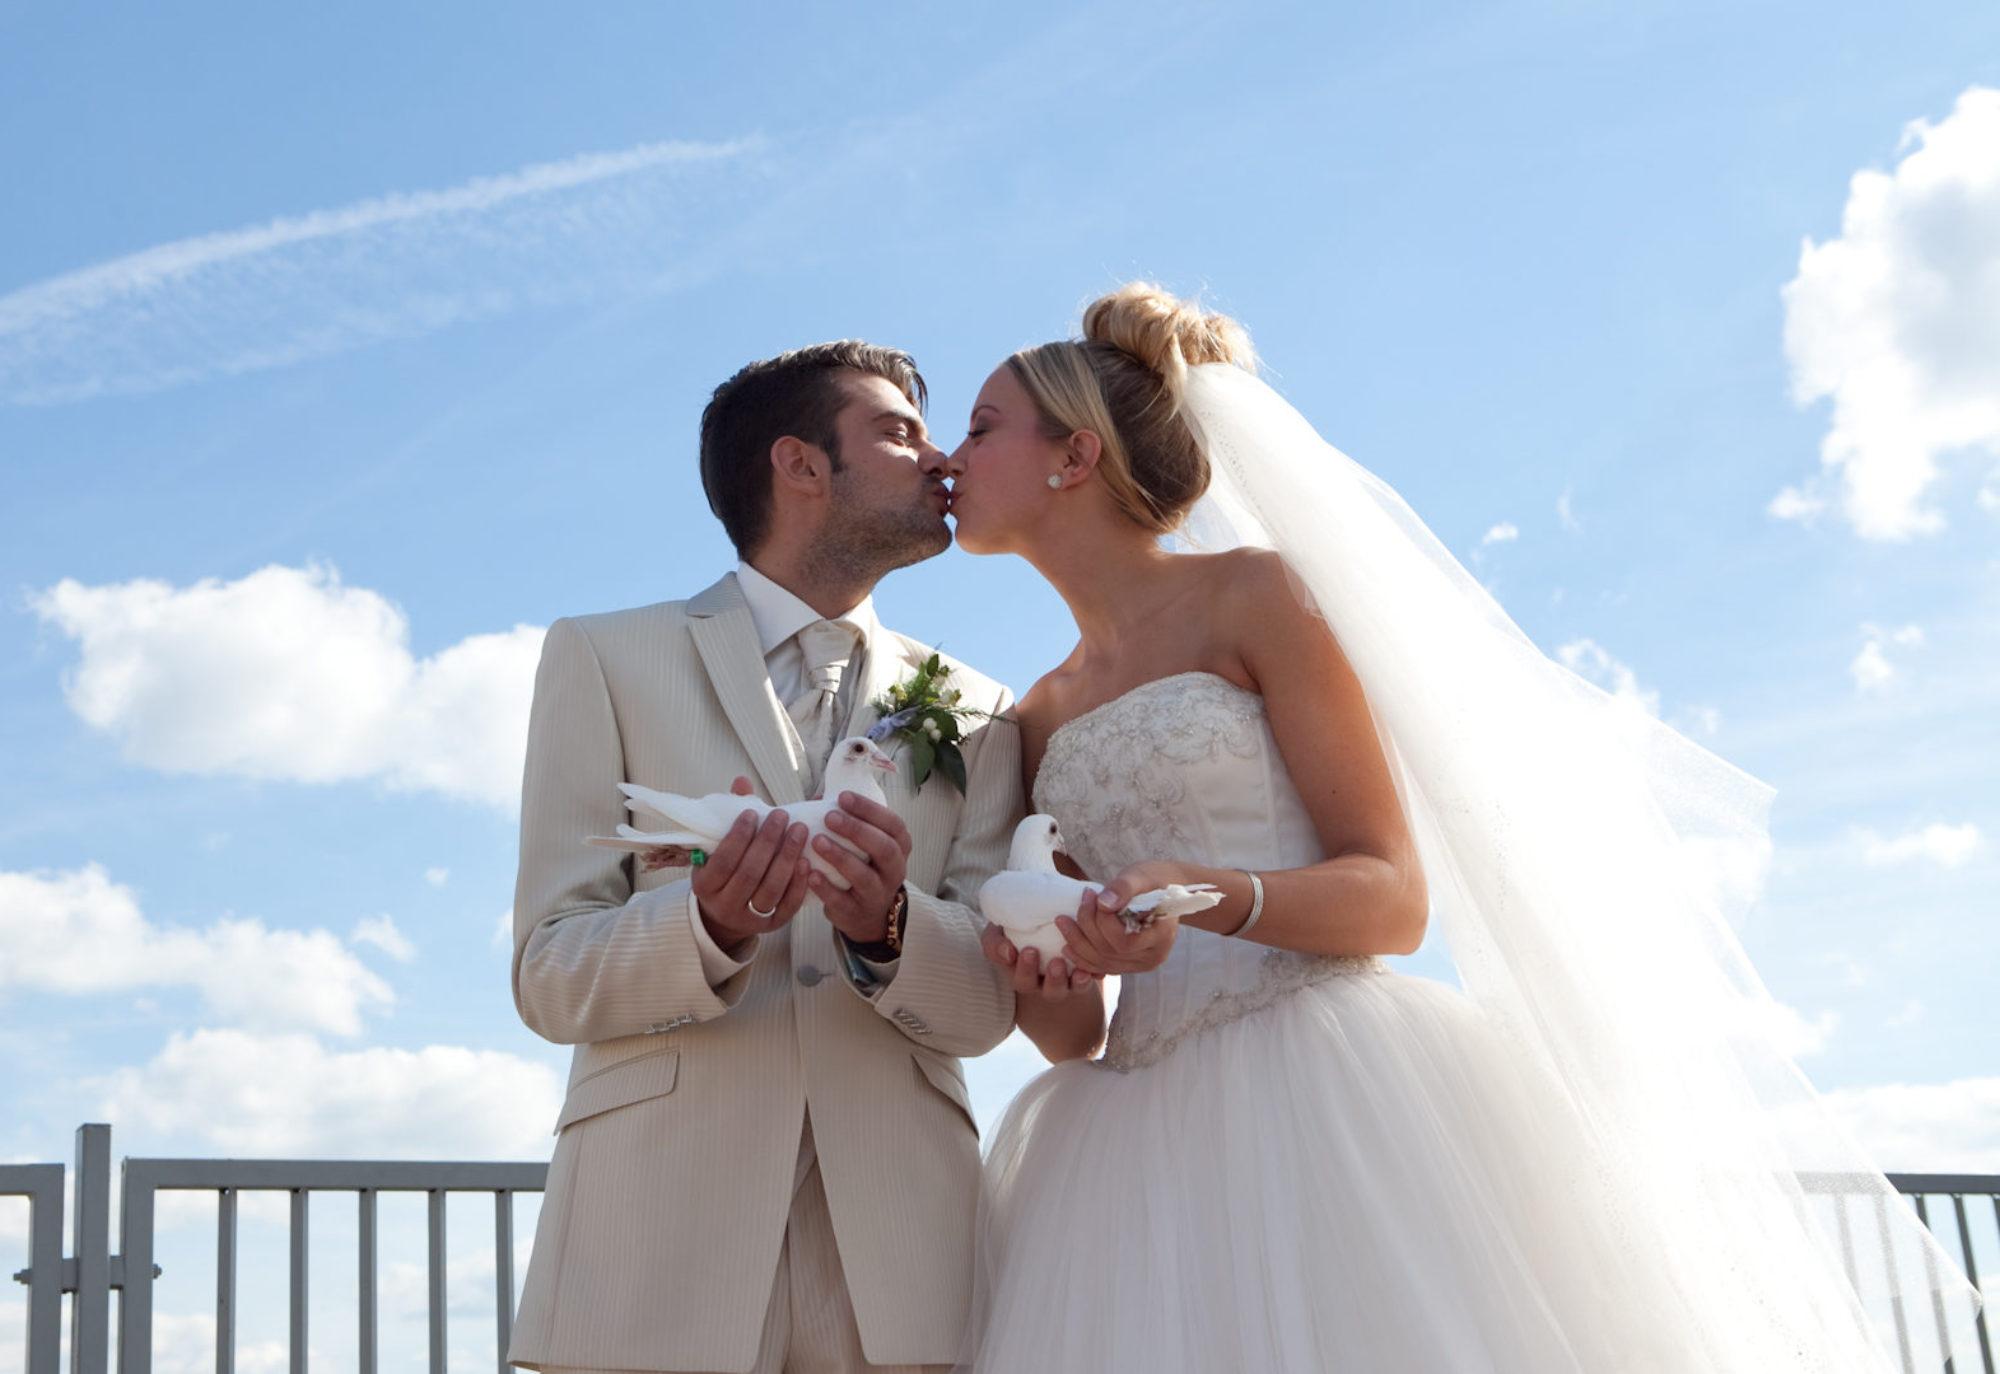 Huwelijksduiven.be